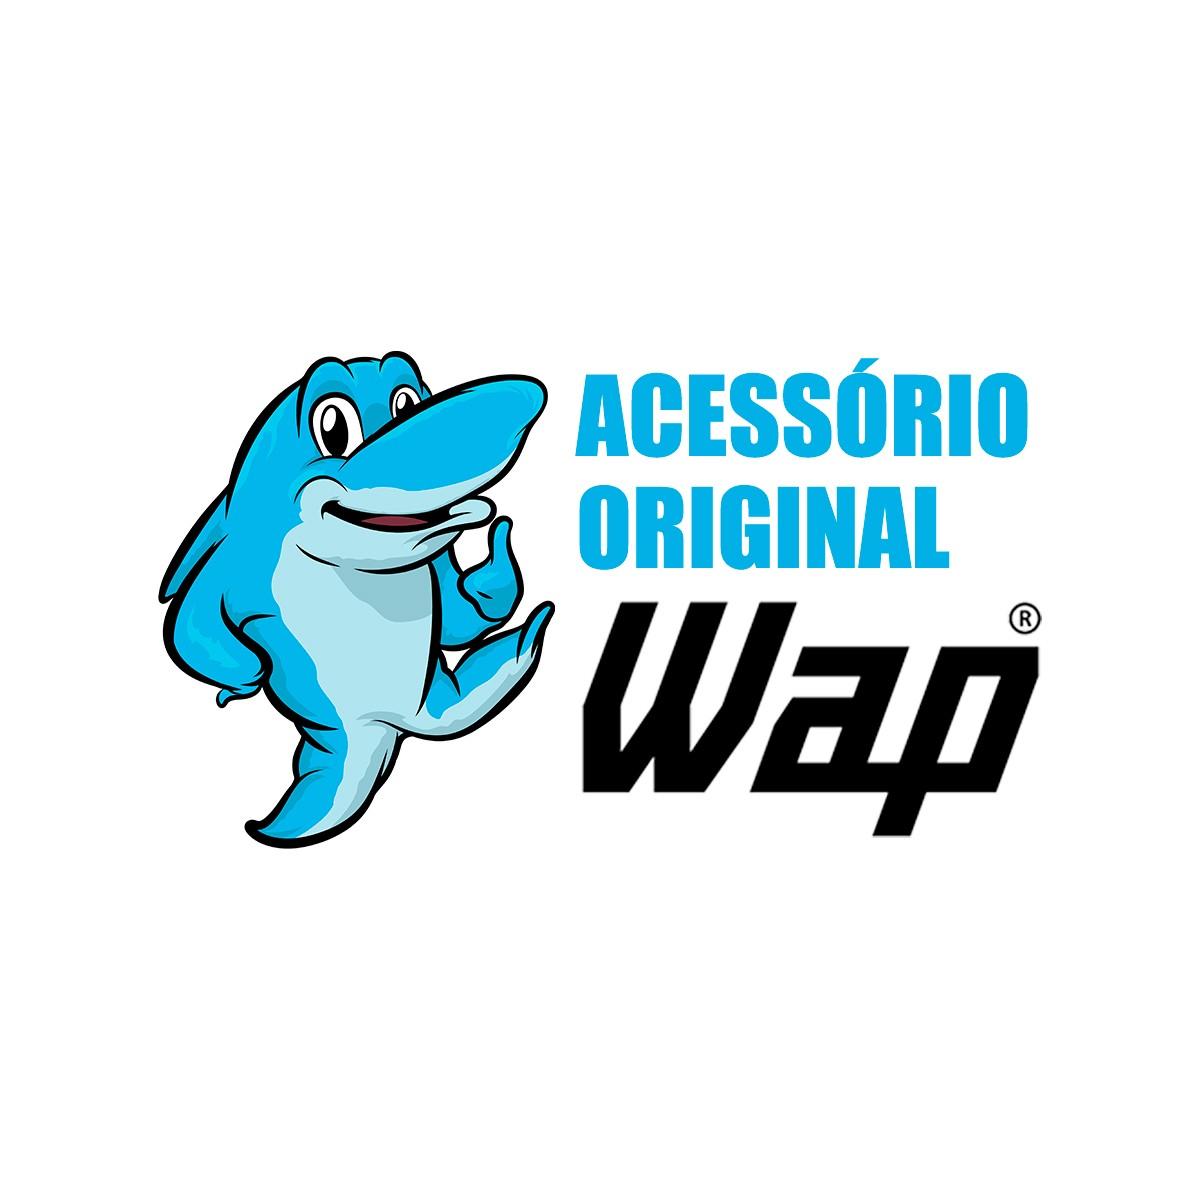 Bico Múltiplo para Aspirador Wap Ambiance Black, Ambiance Turbo, Ambiance Bagless, GTW 10, GTW 12 Inox, GTW 20, GTW 20 Inox Encaixe de 32mm Original